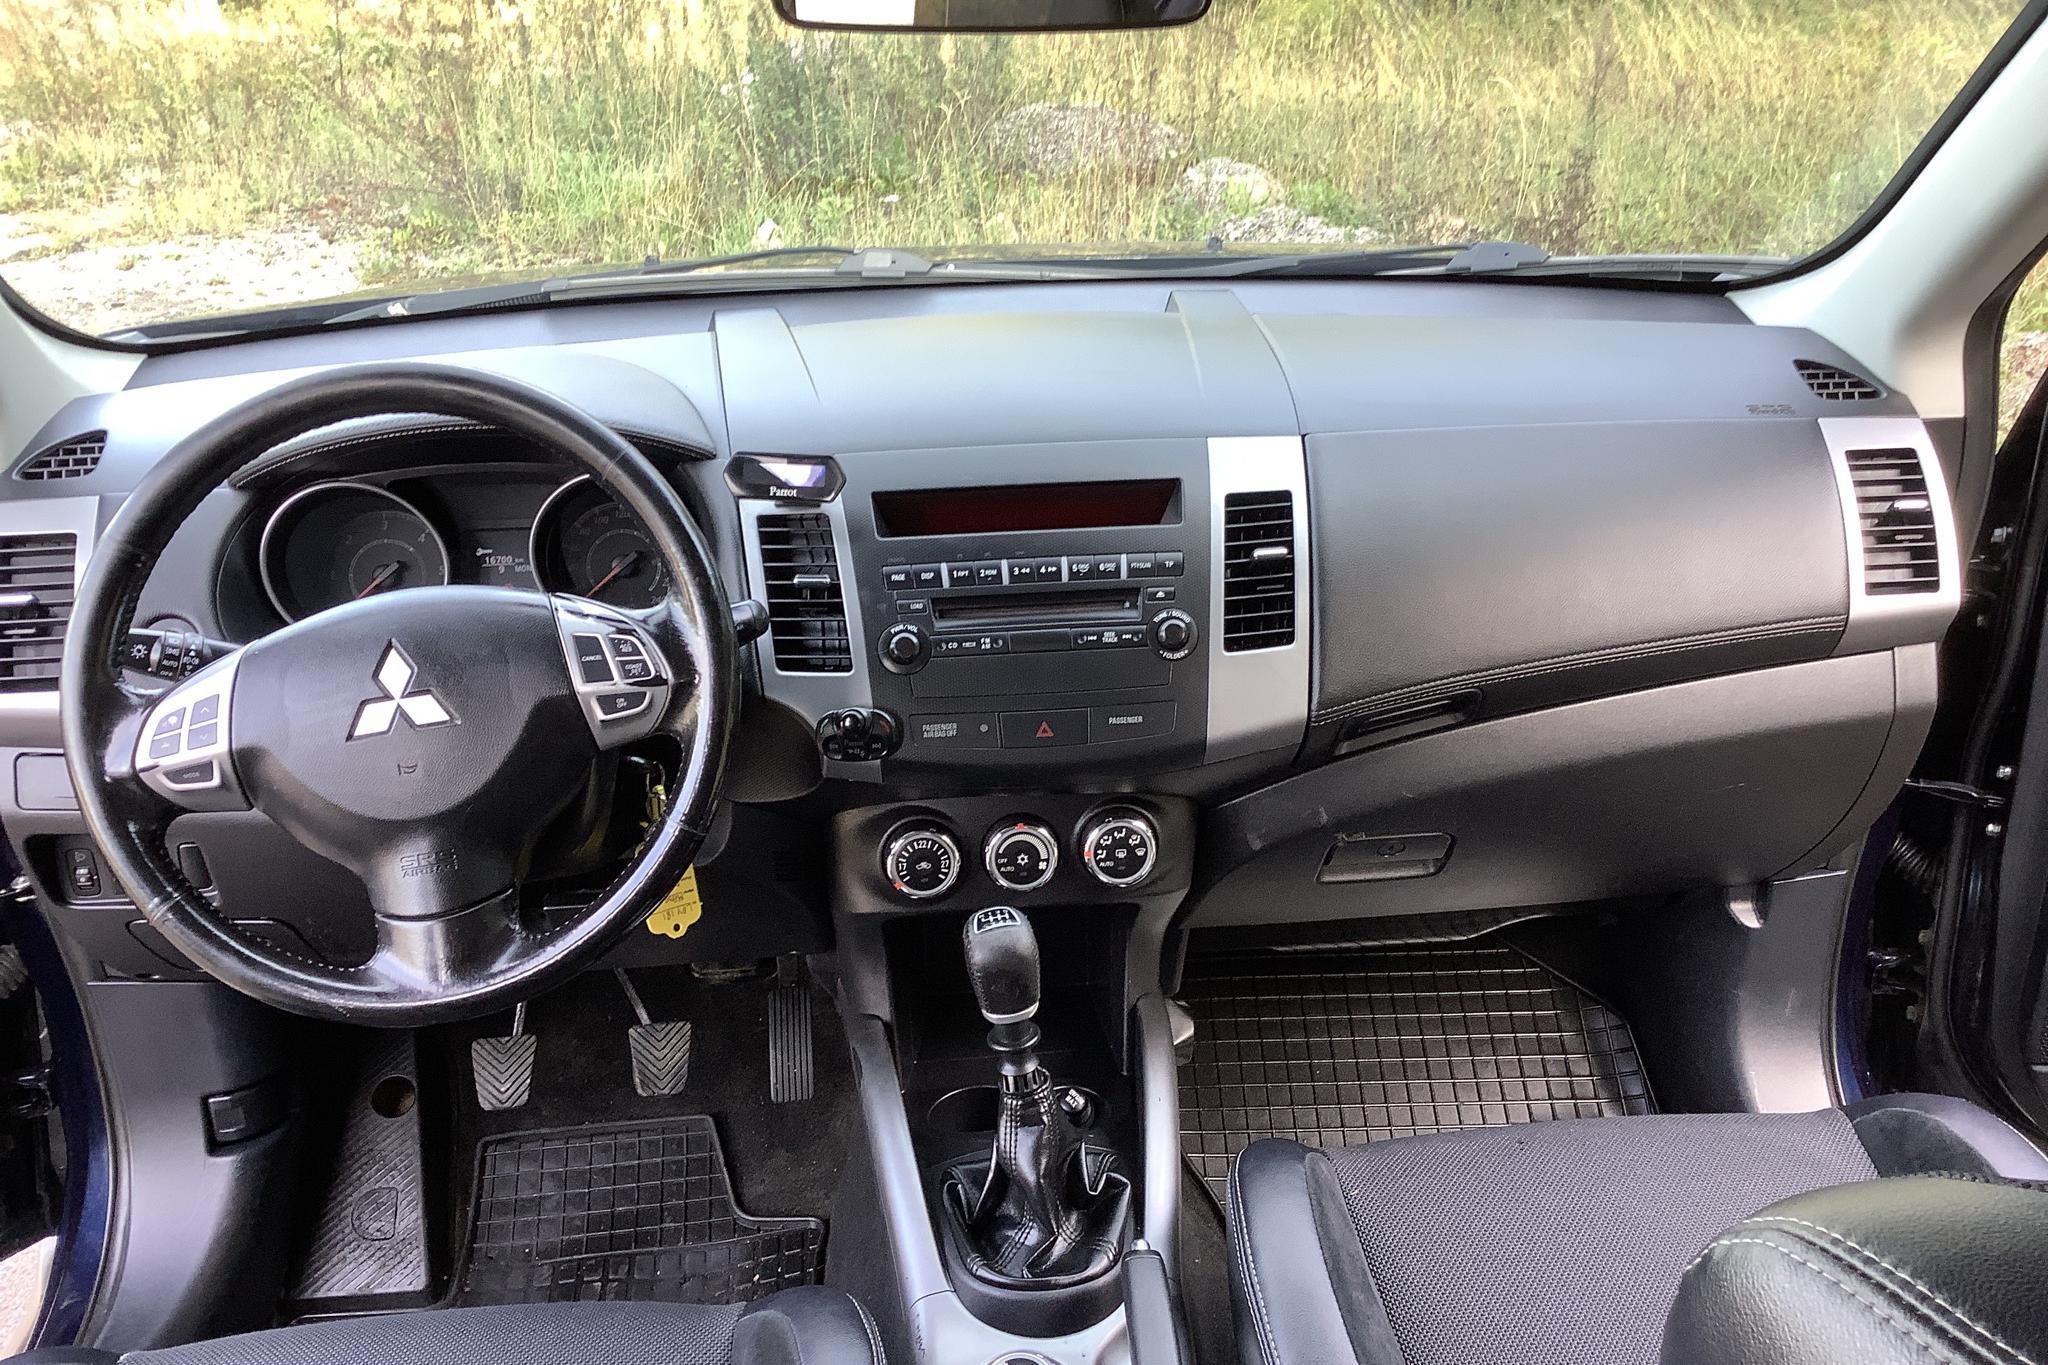 Mitsubishi Outlander 2.2 Di-D (177hk) - 17 210 mil - Manuell - blå - 2011